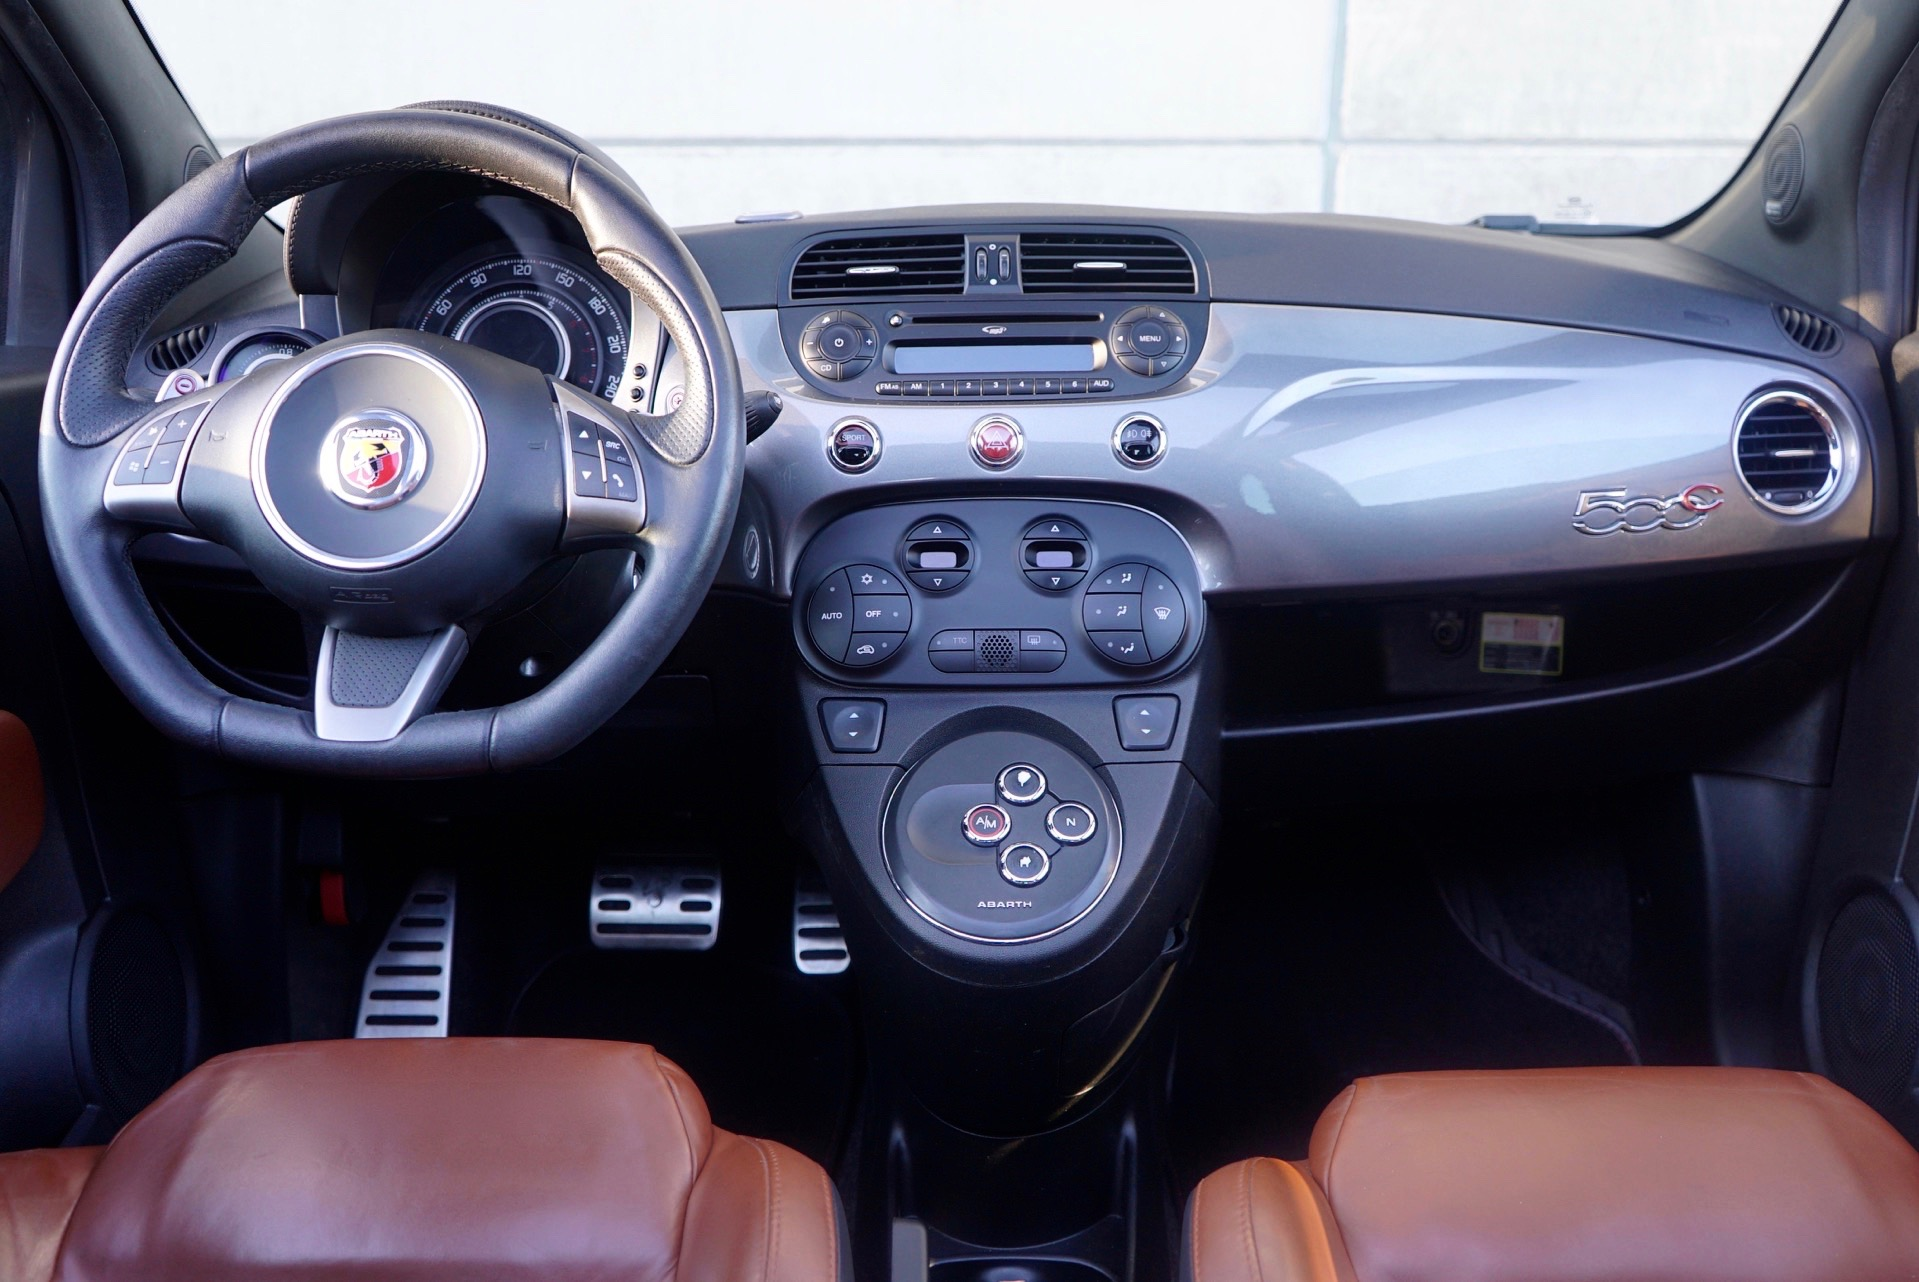 FIAT 500C ABARTH 1.4 16V TURBO